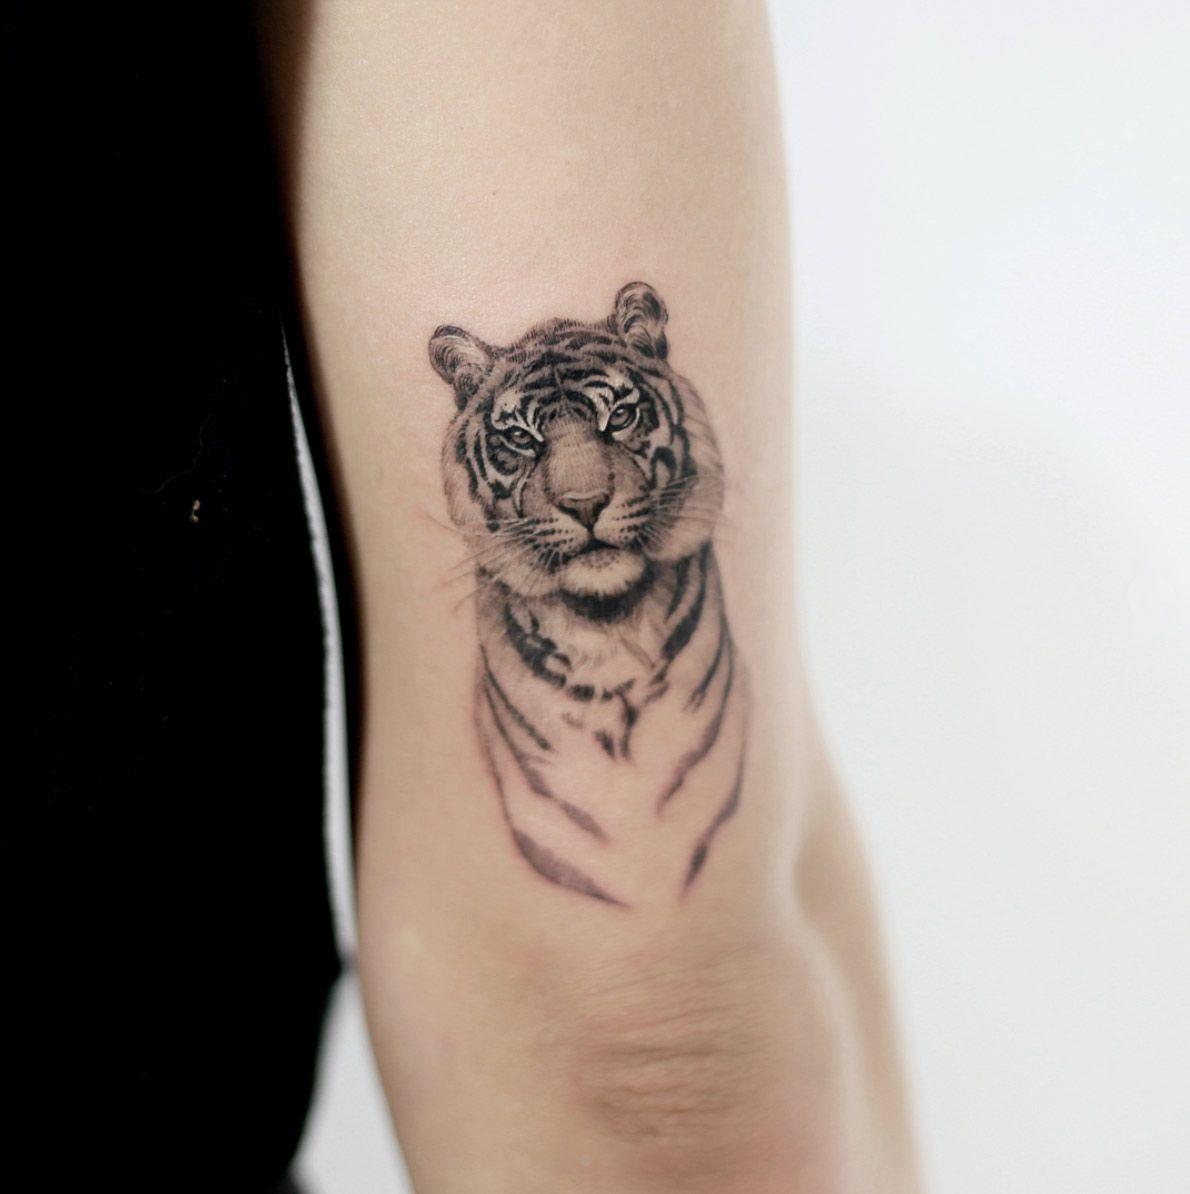 90 Tiger And Lion Tattoos That Define Perfection Eye Tattoo Tattoos Tiger Tattoo